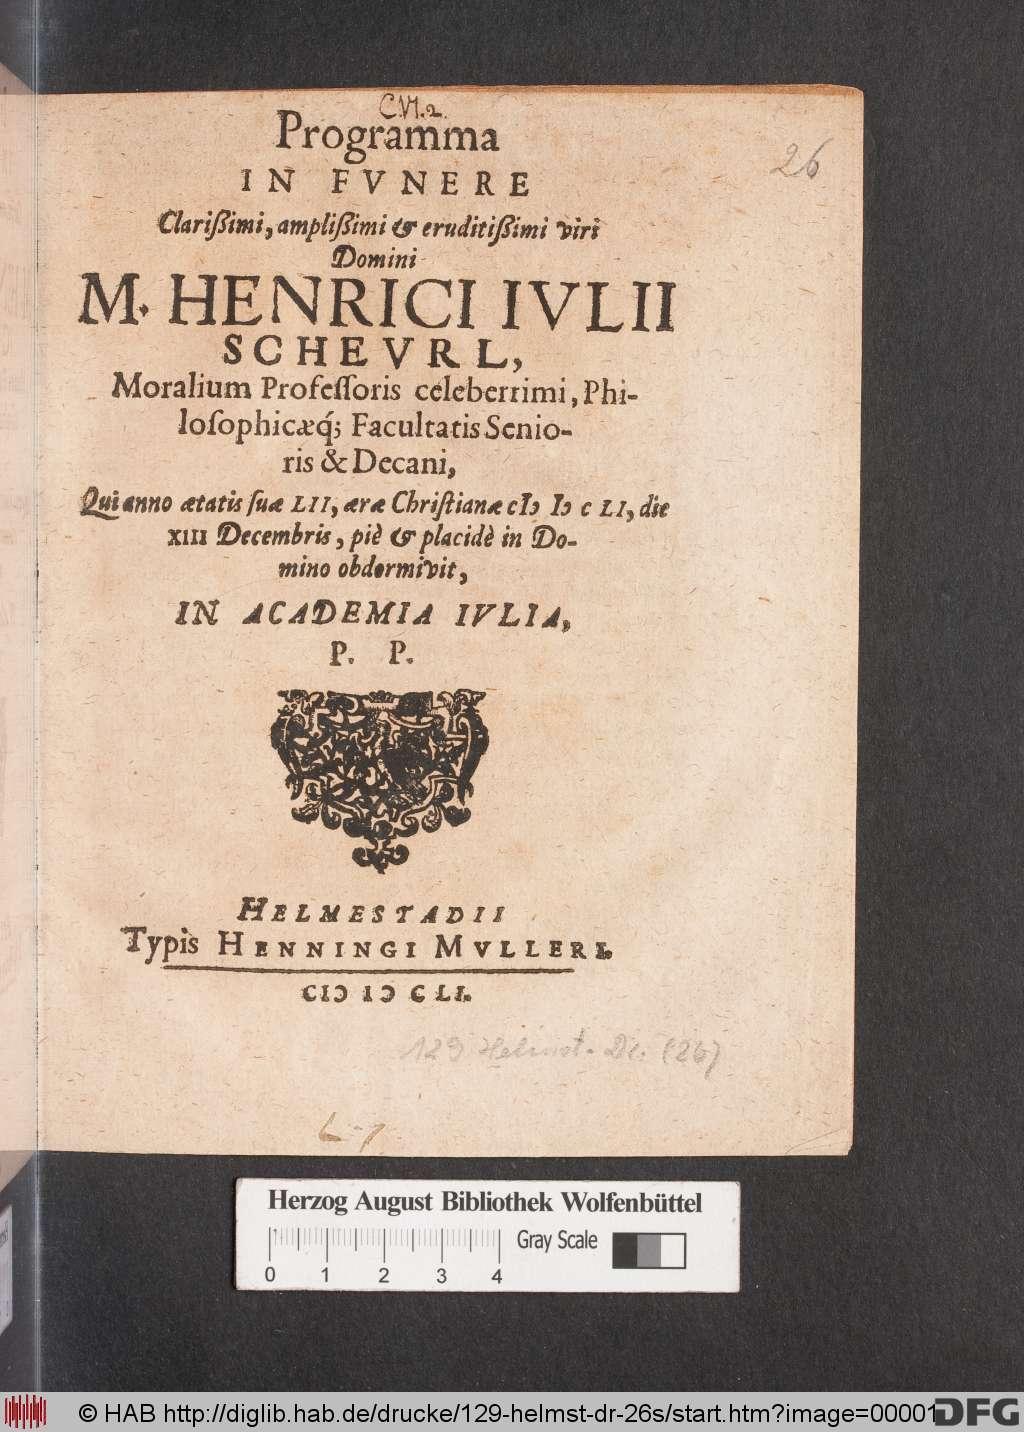 http://diglib.hab.de/drucke/129-helmst-dr-26s/00001.jpg